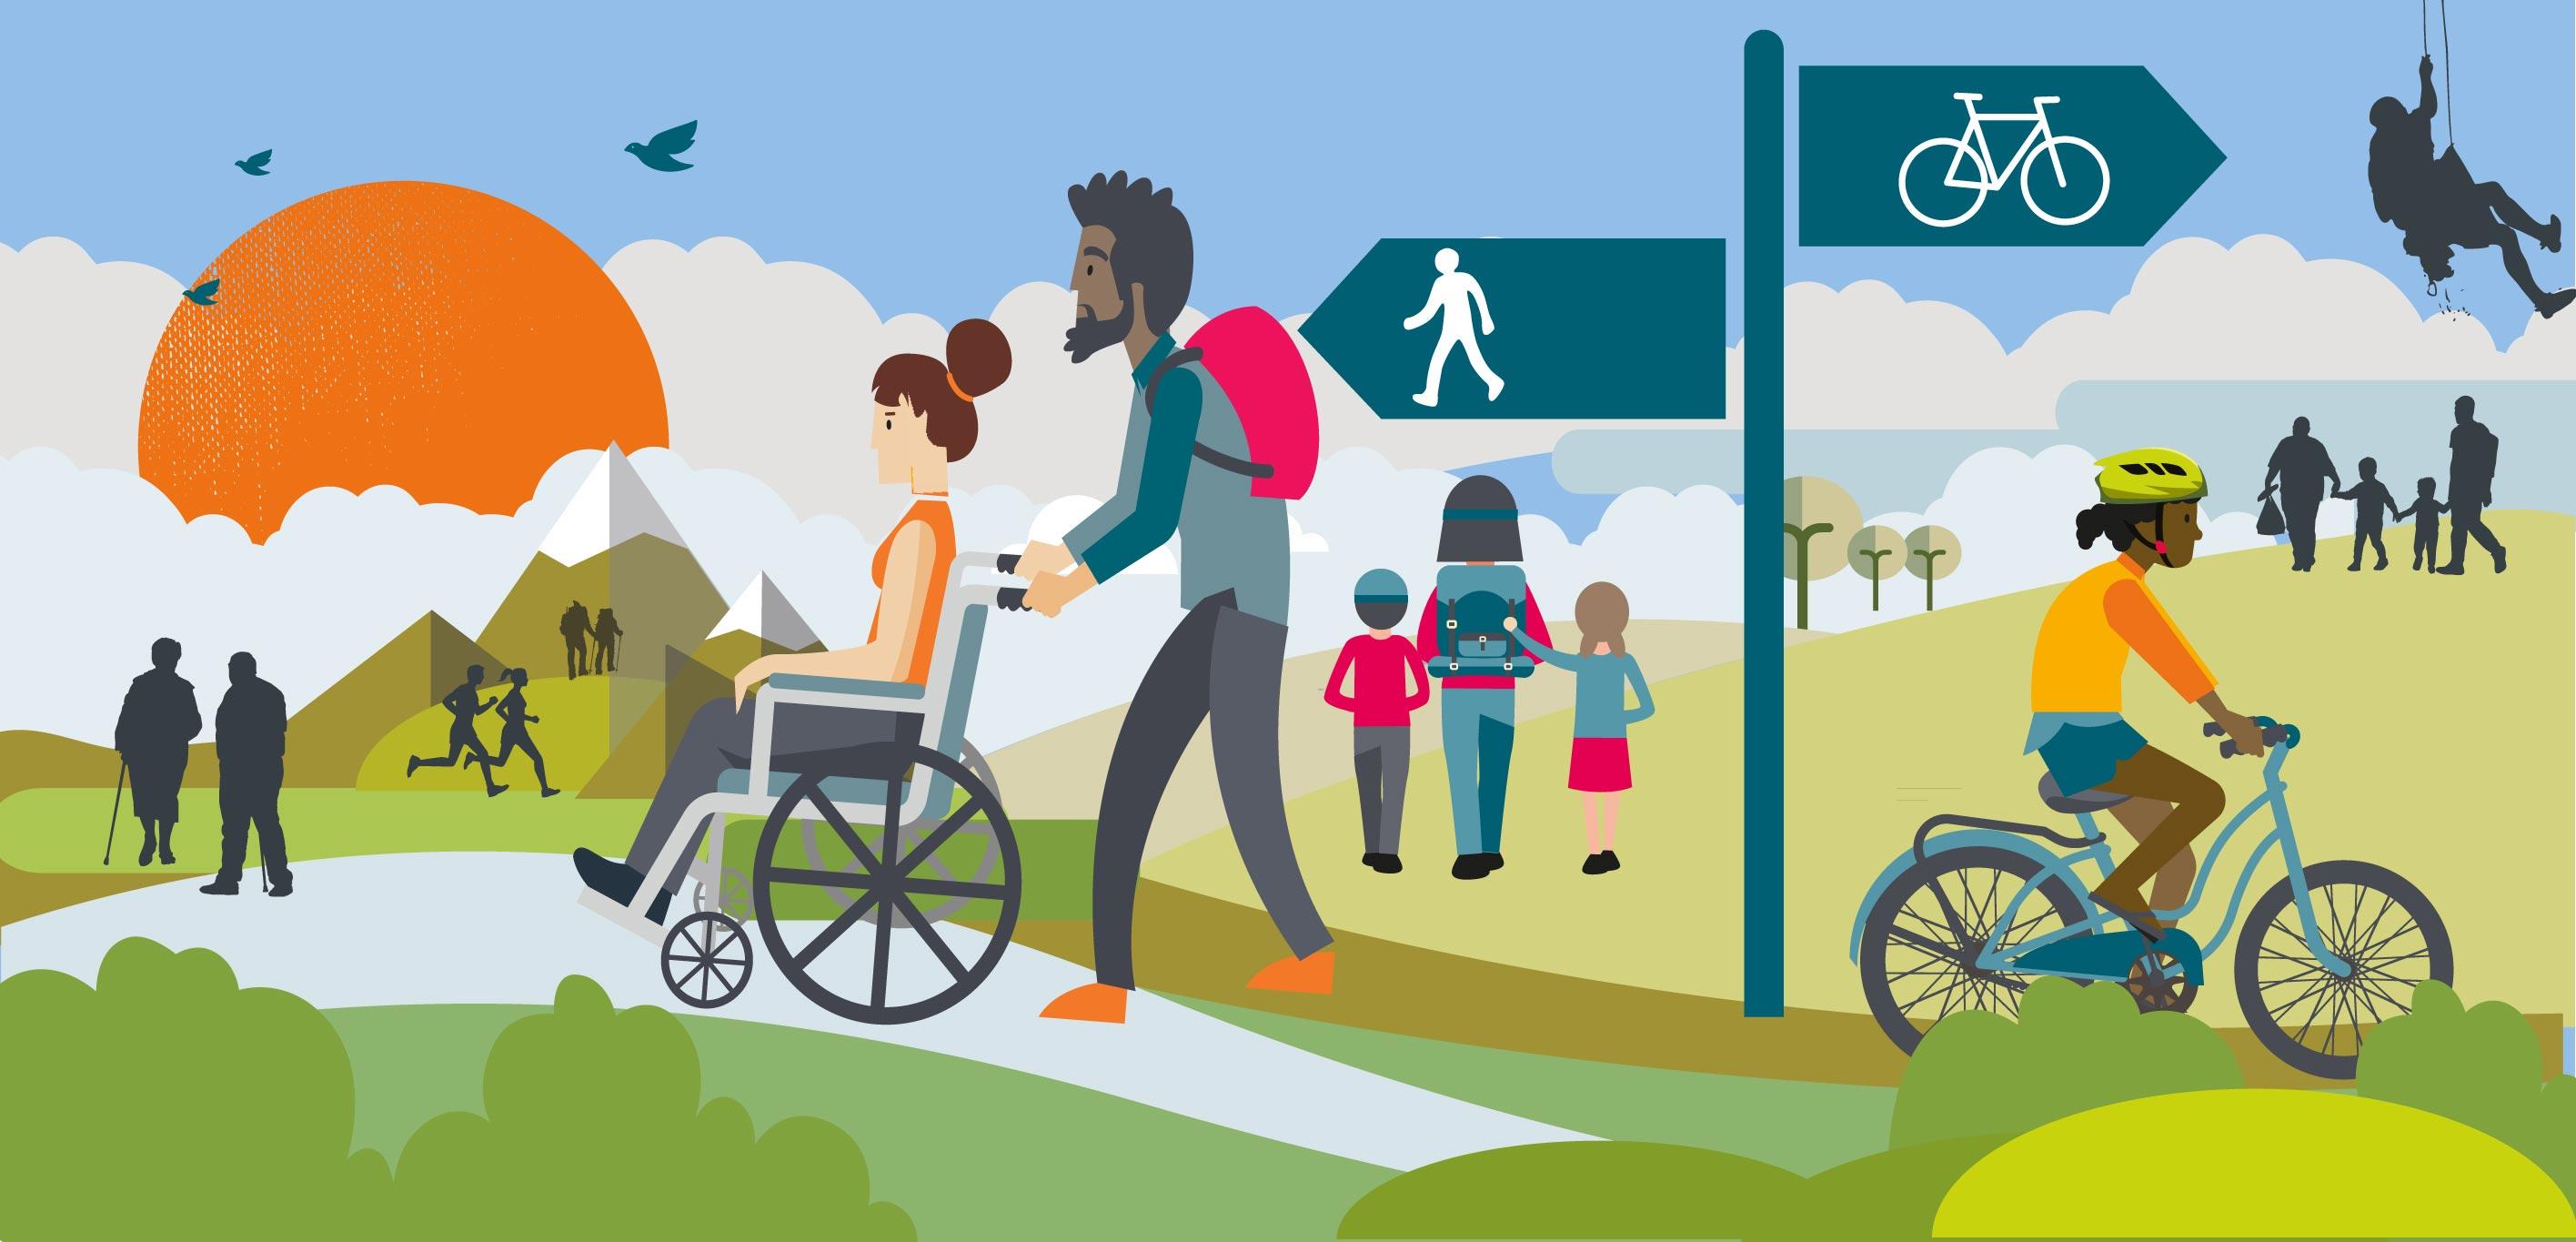 Lake District National Park Partnership vision